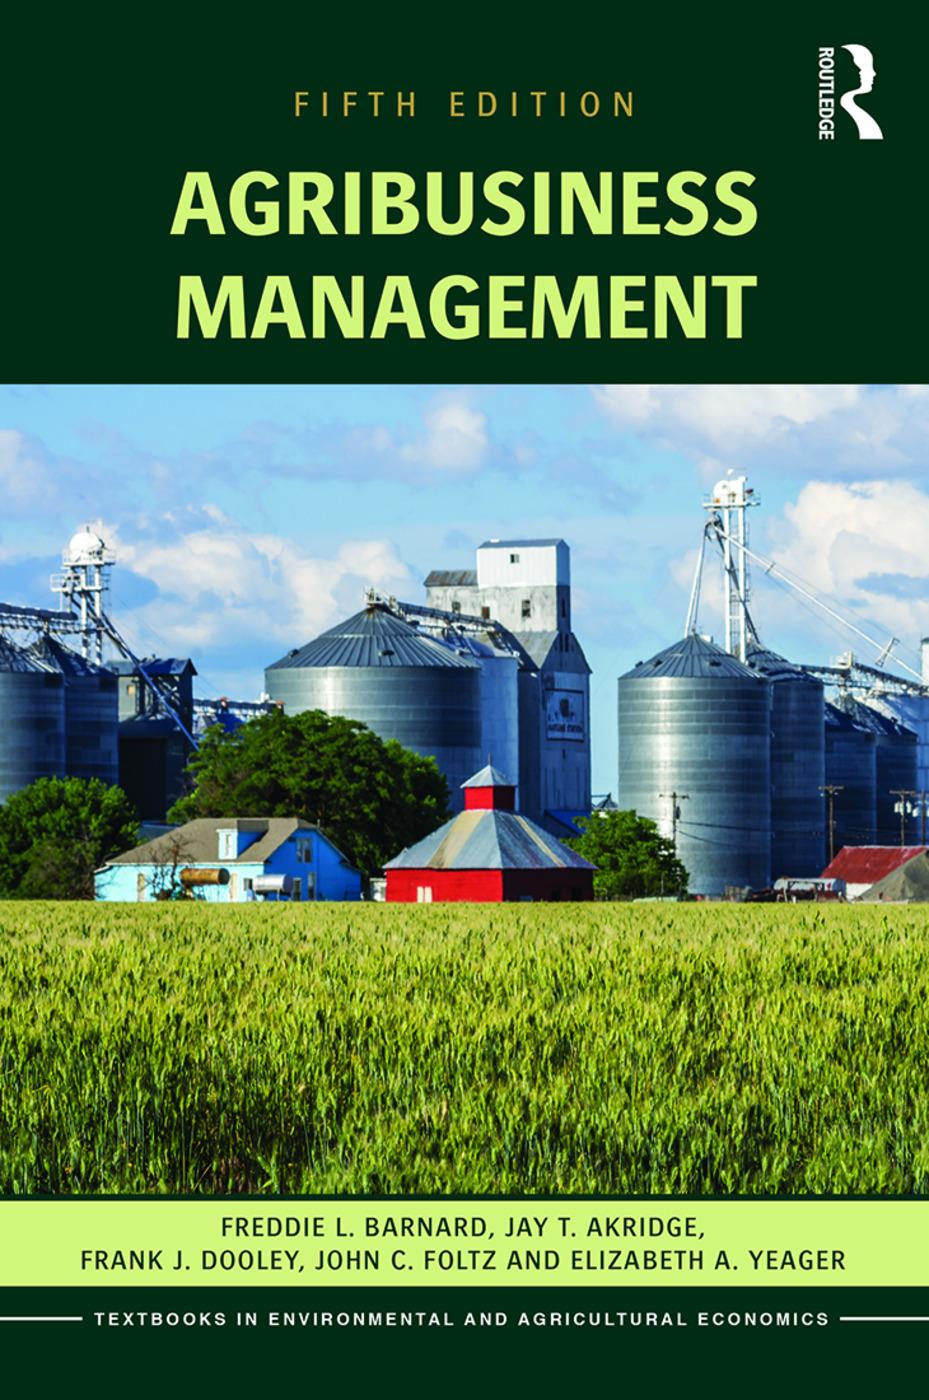 Agribusiness Management By Freddie L. Barnard, John Foltz and Elizabeth A. Yeager